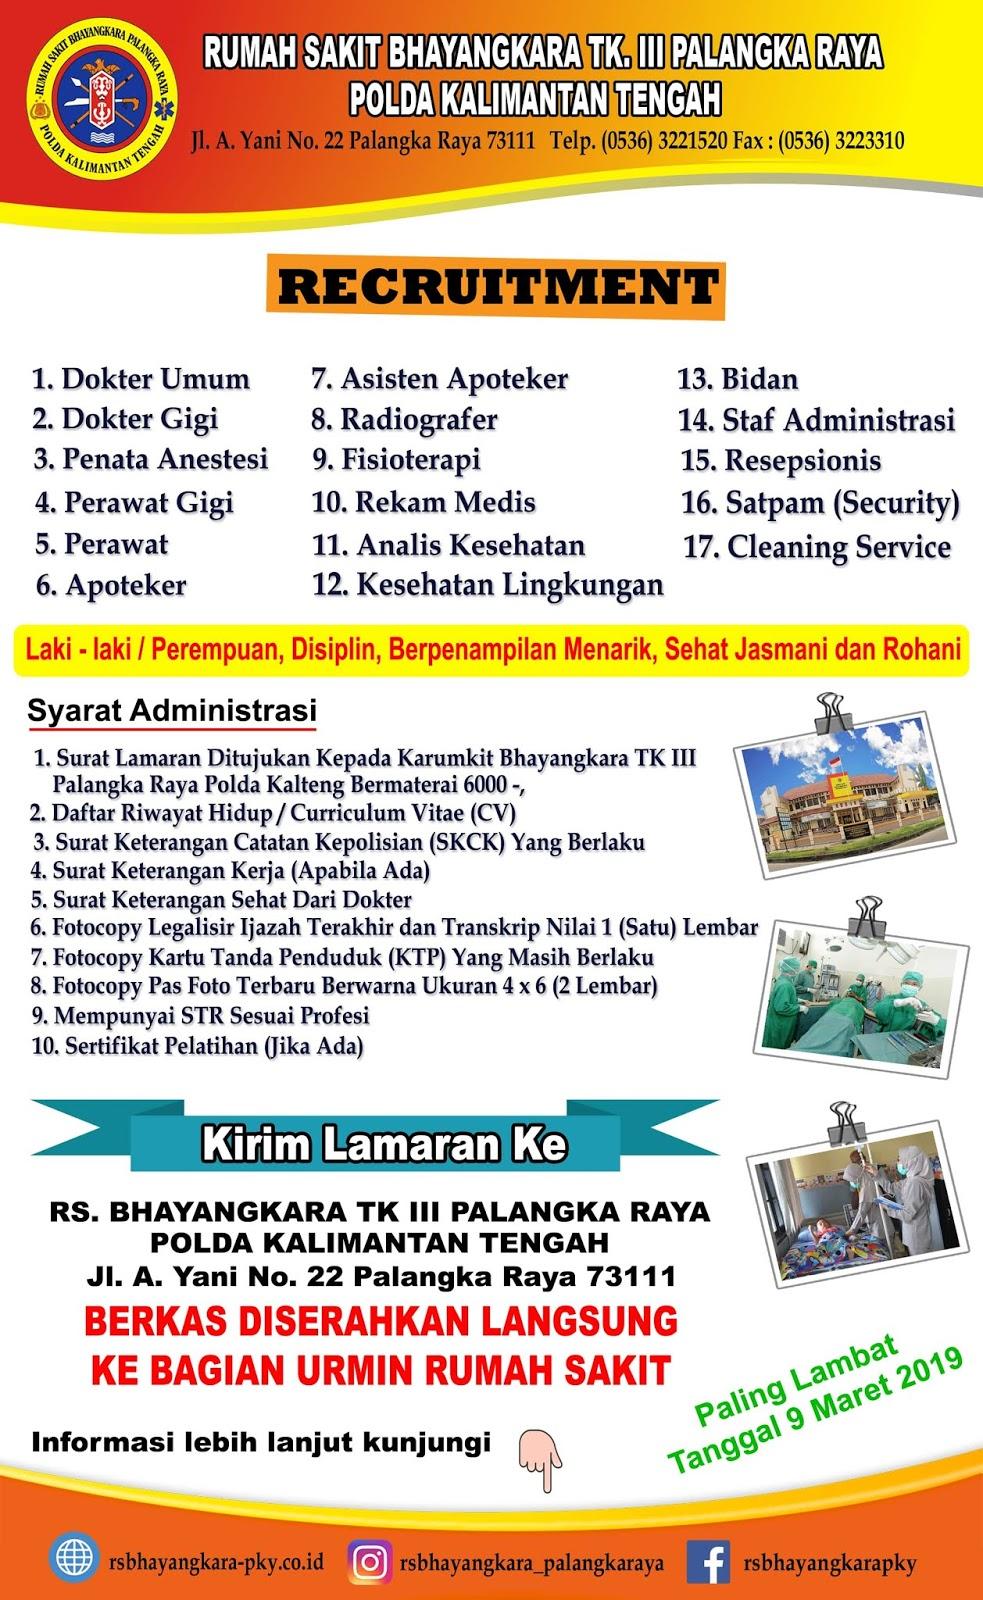 Lowongan Kerja Rumah Sakit Bhayangkara Palangka Raya 2019 17 Posisi Lowongan Lowongan Kerja Kalimantan Tengah